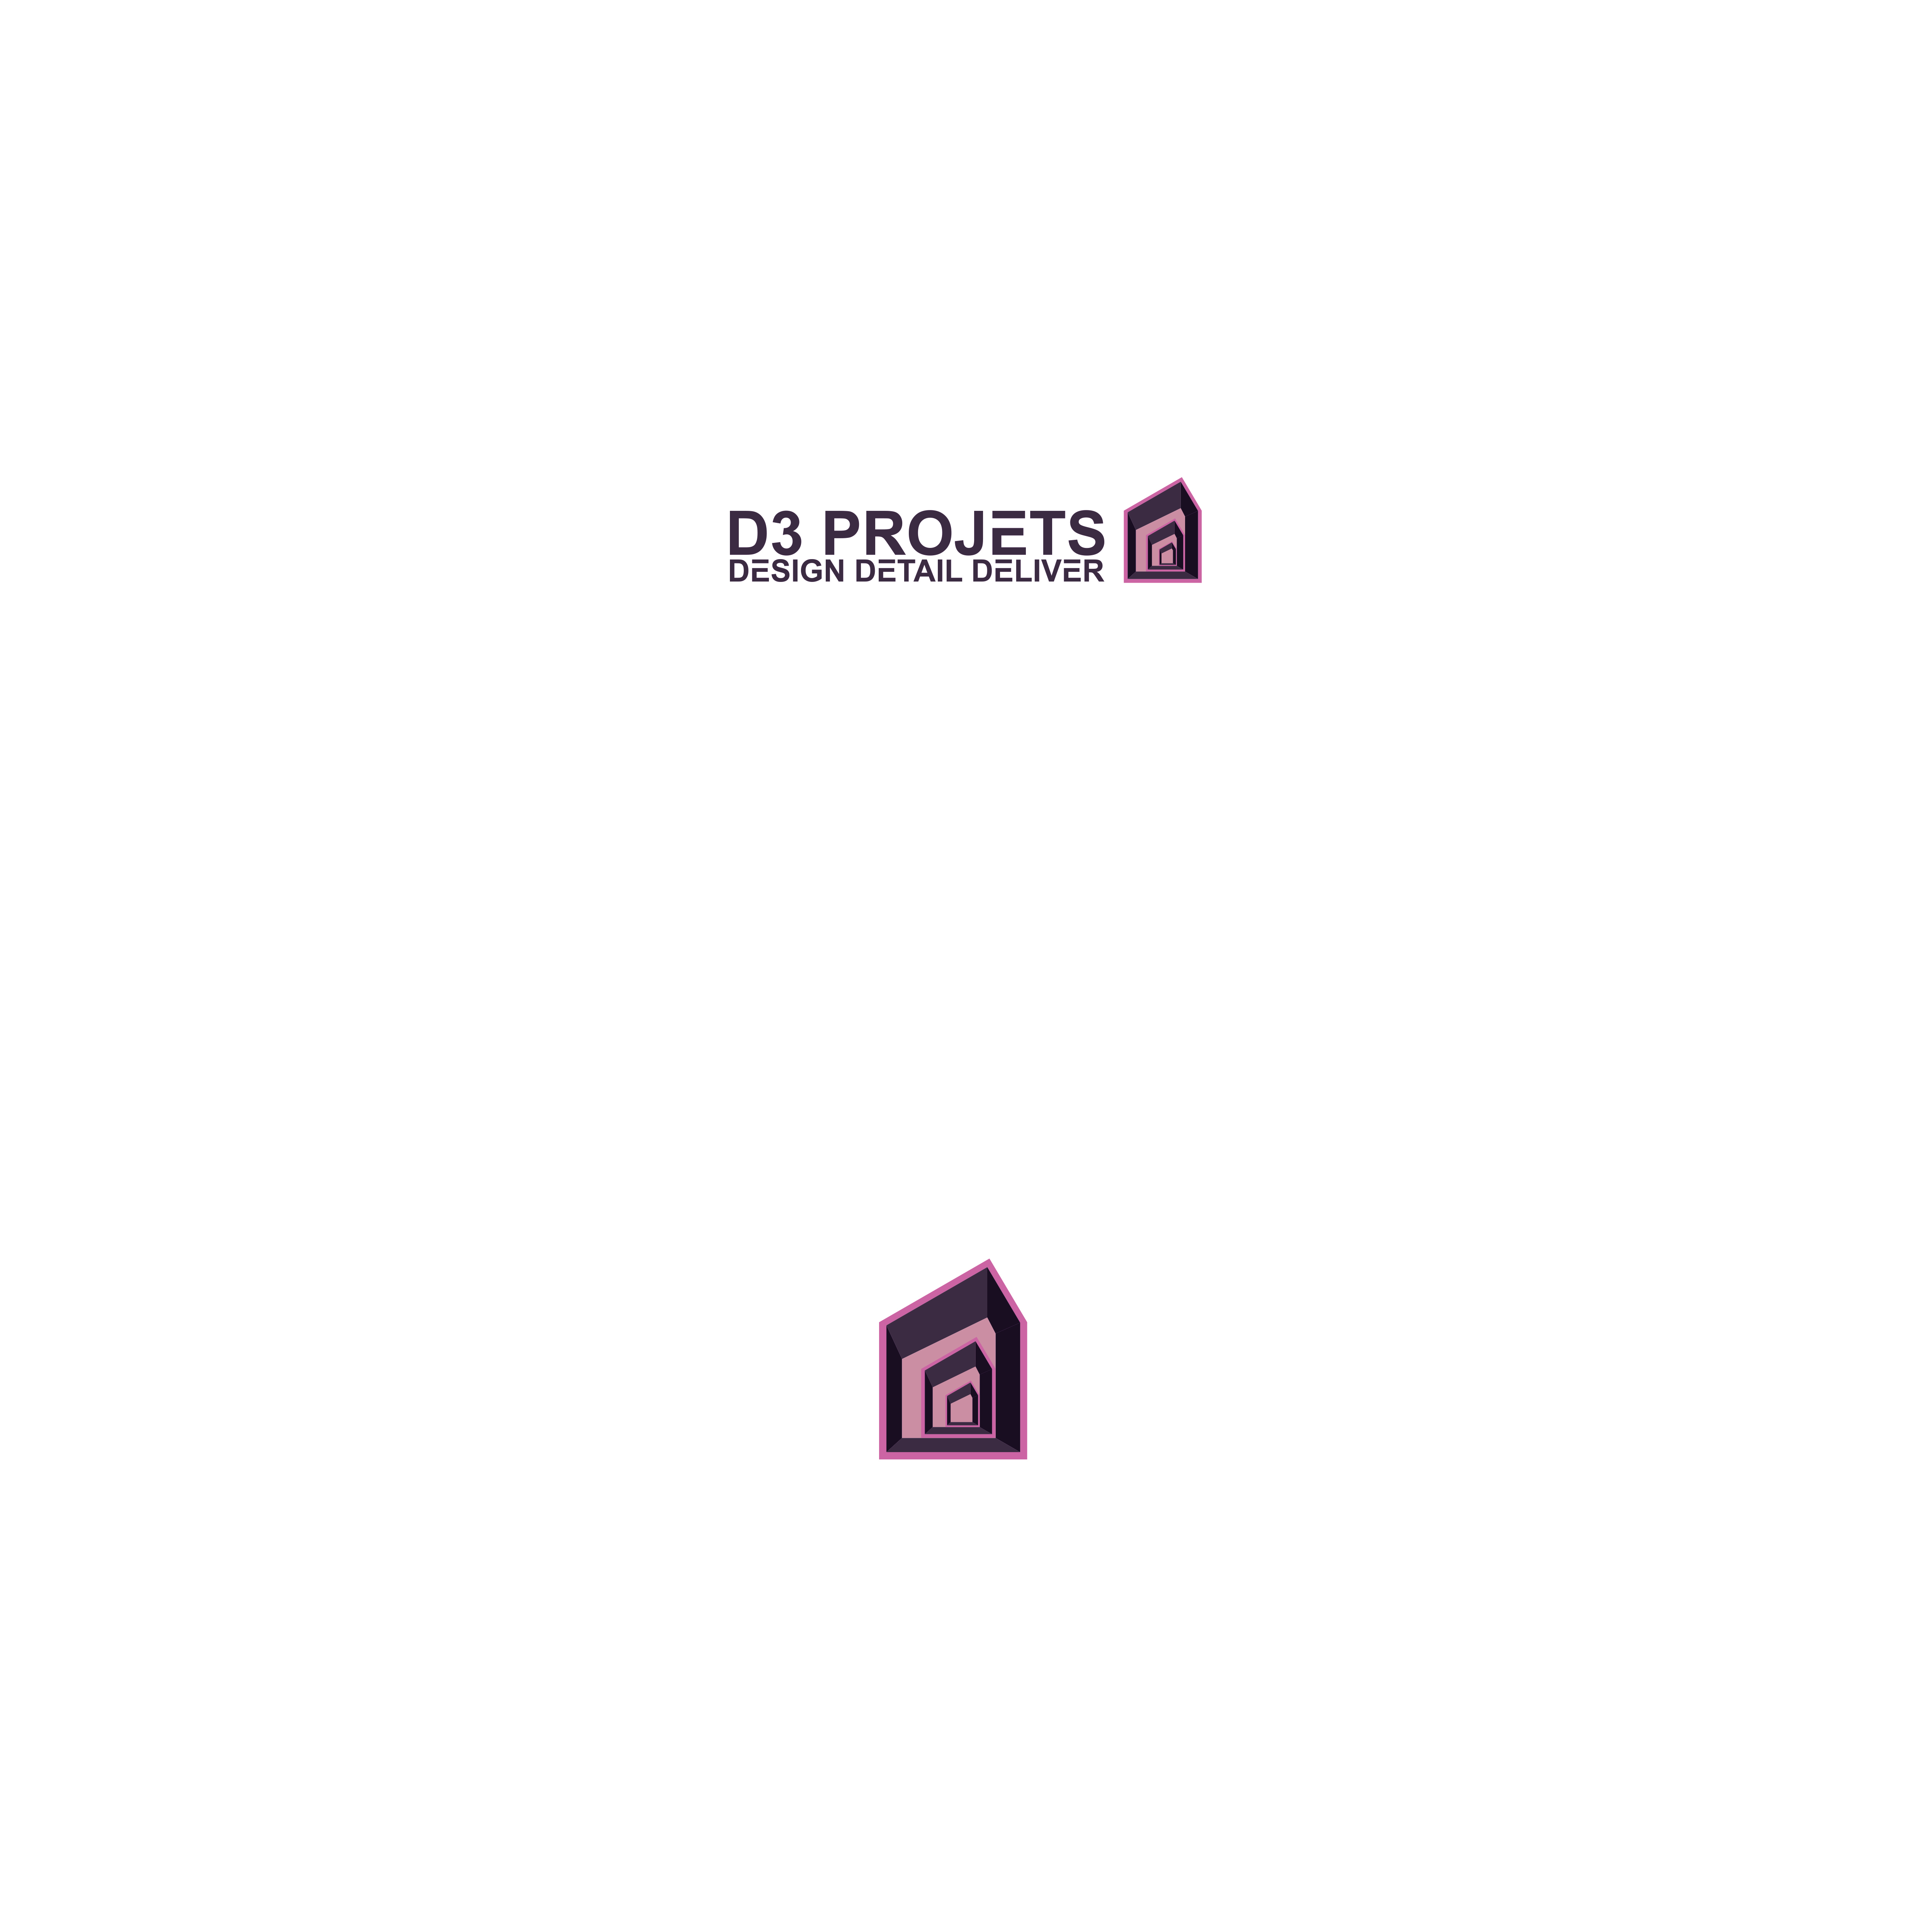 Professional Masculine Interior Design Logo Design For D3 Projects Company Name Design Detail Deliver Is Our Slogan By Emmanuel 23 Design 24047749